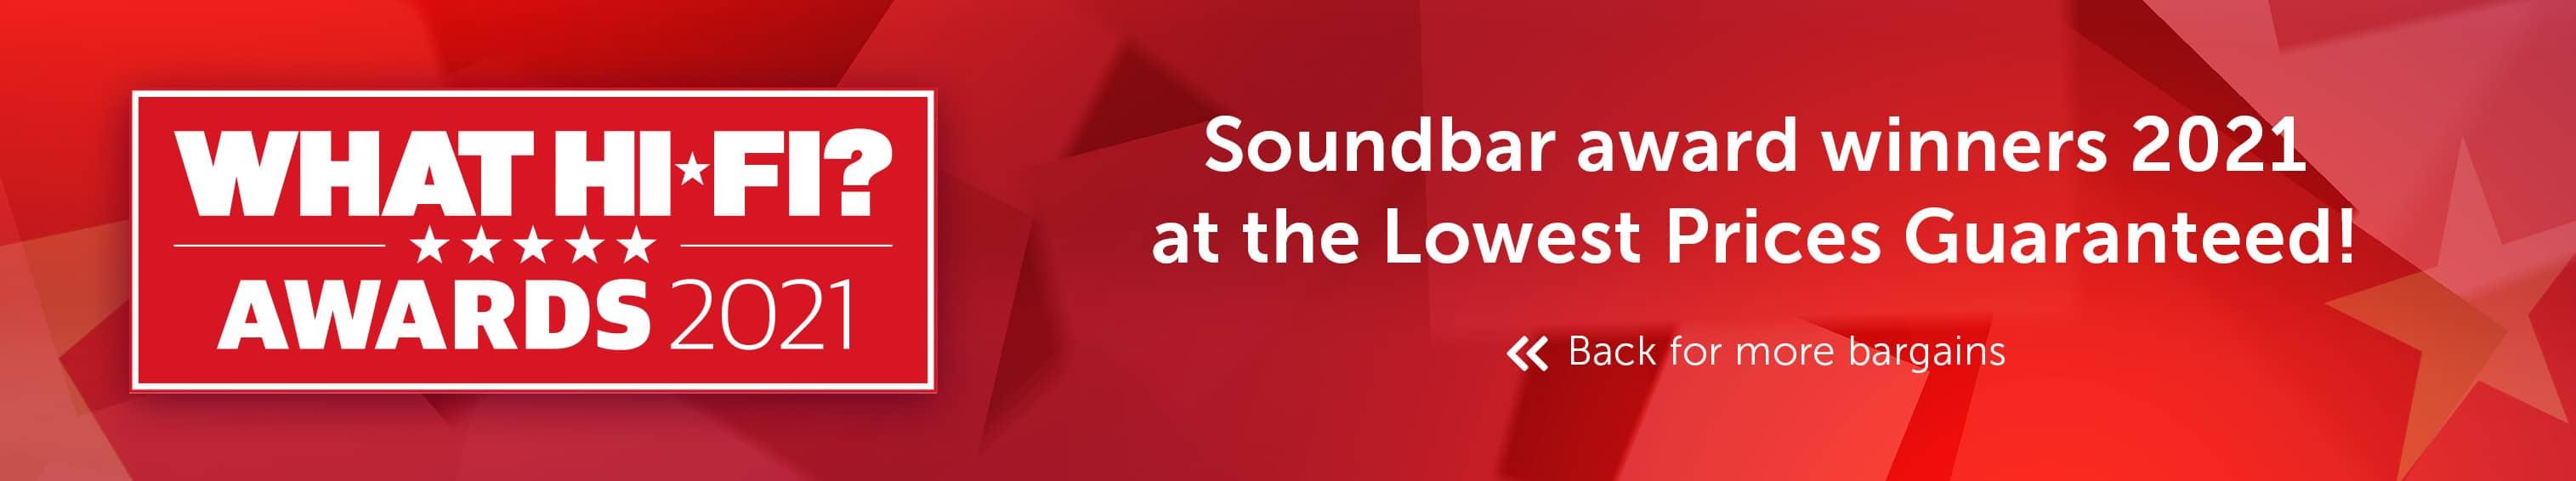 What Hi-Fi? Best Buy Awards 2021 - Soundbar